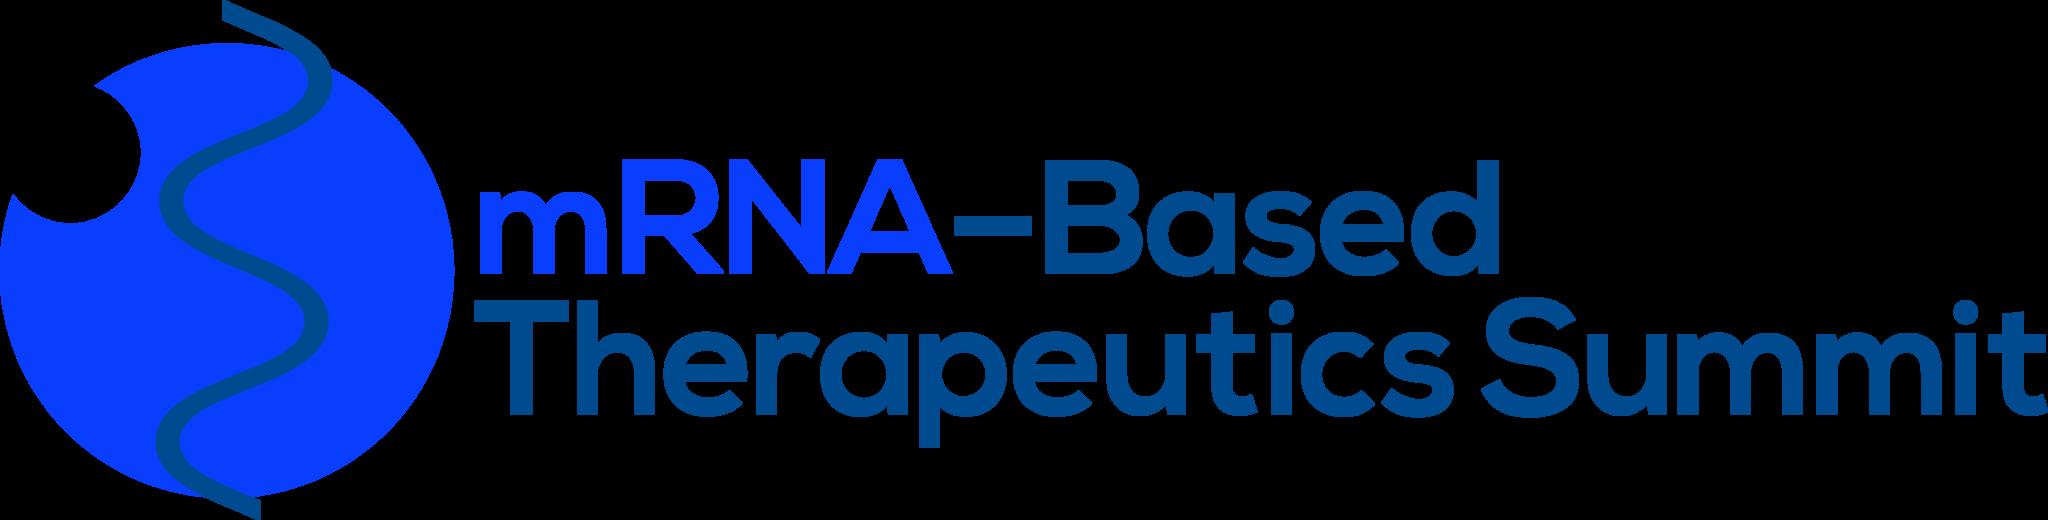 mRNA-Based-Therapeutics-2048x520